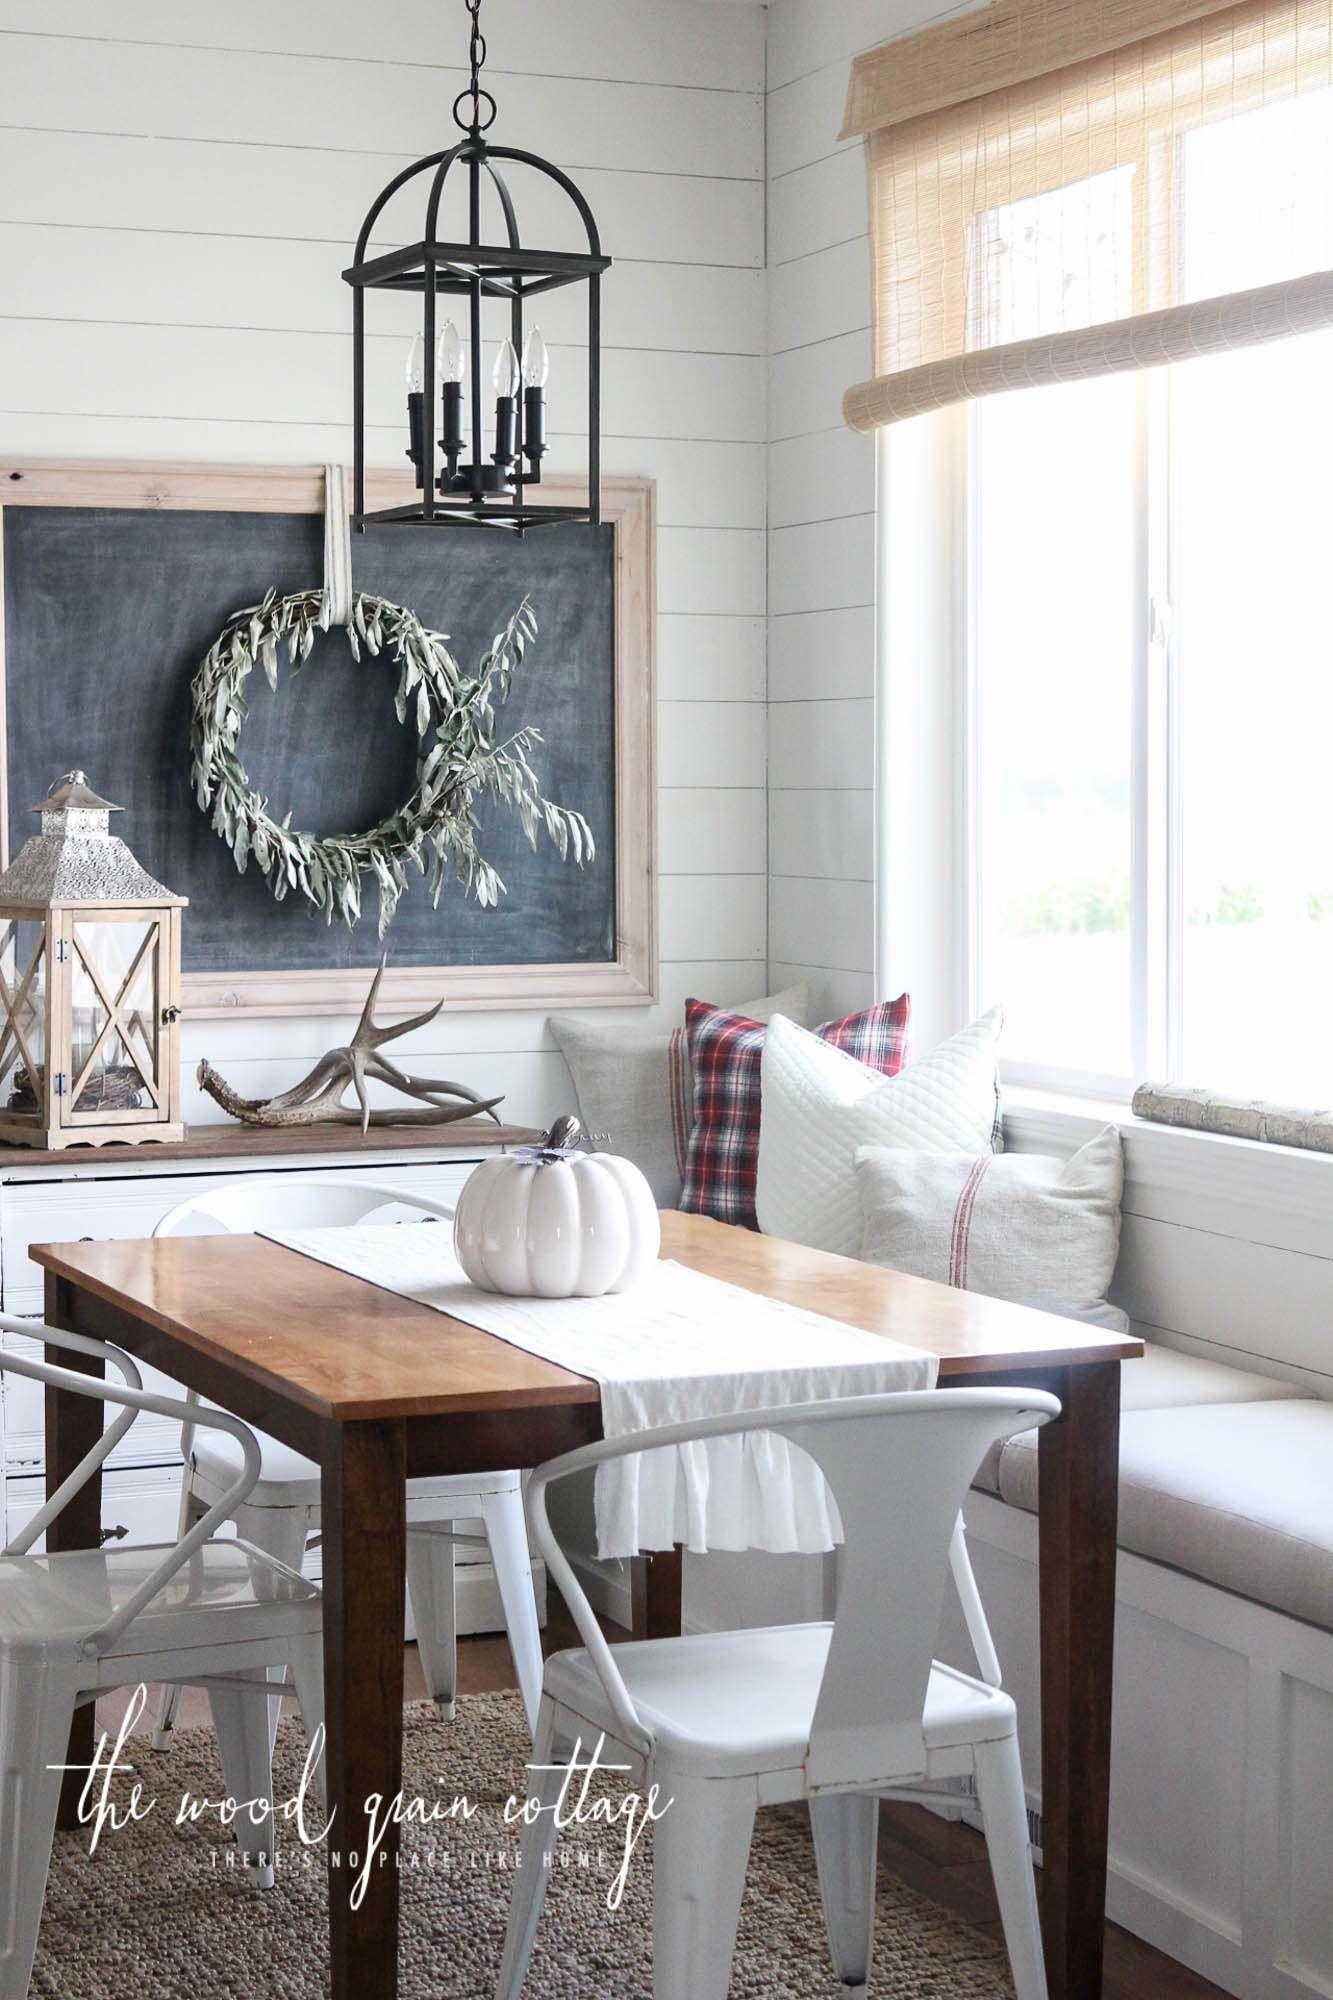 Incredibly inspiring fall decor ideas to transform your home